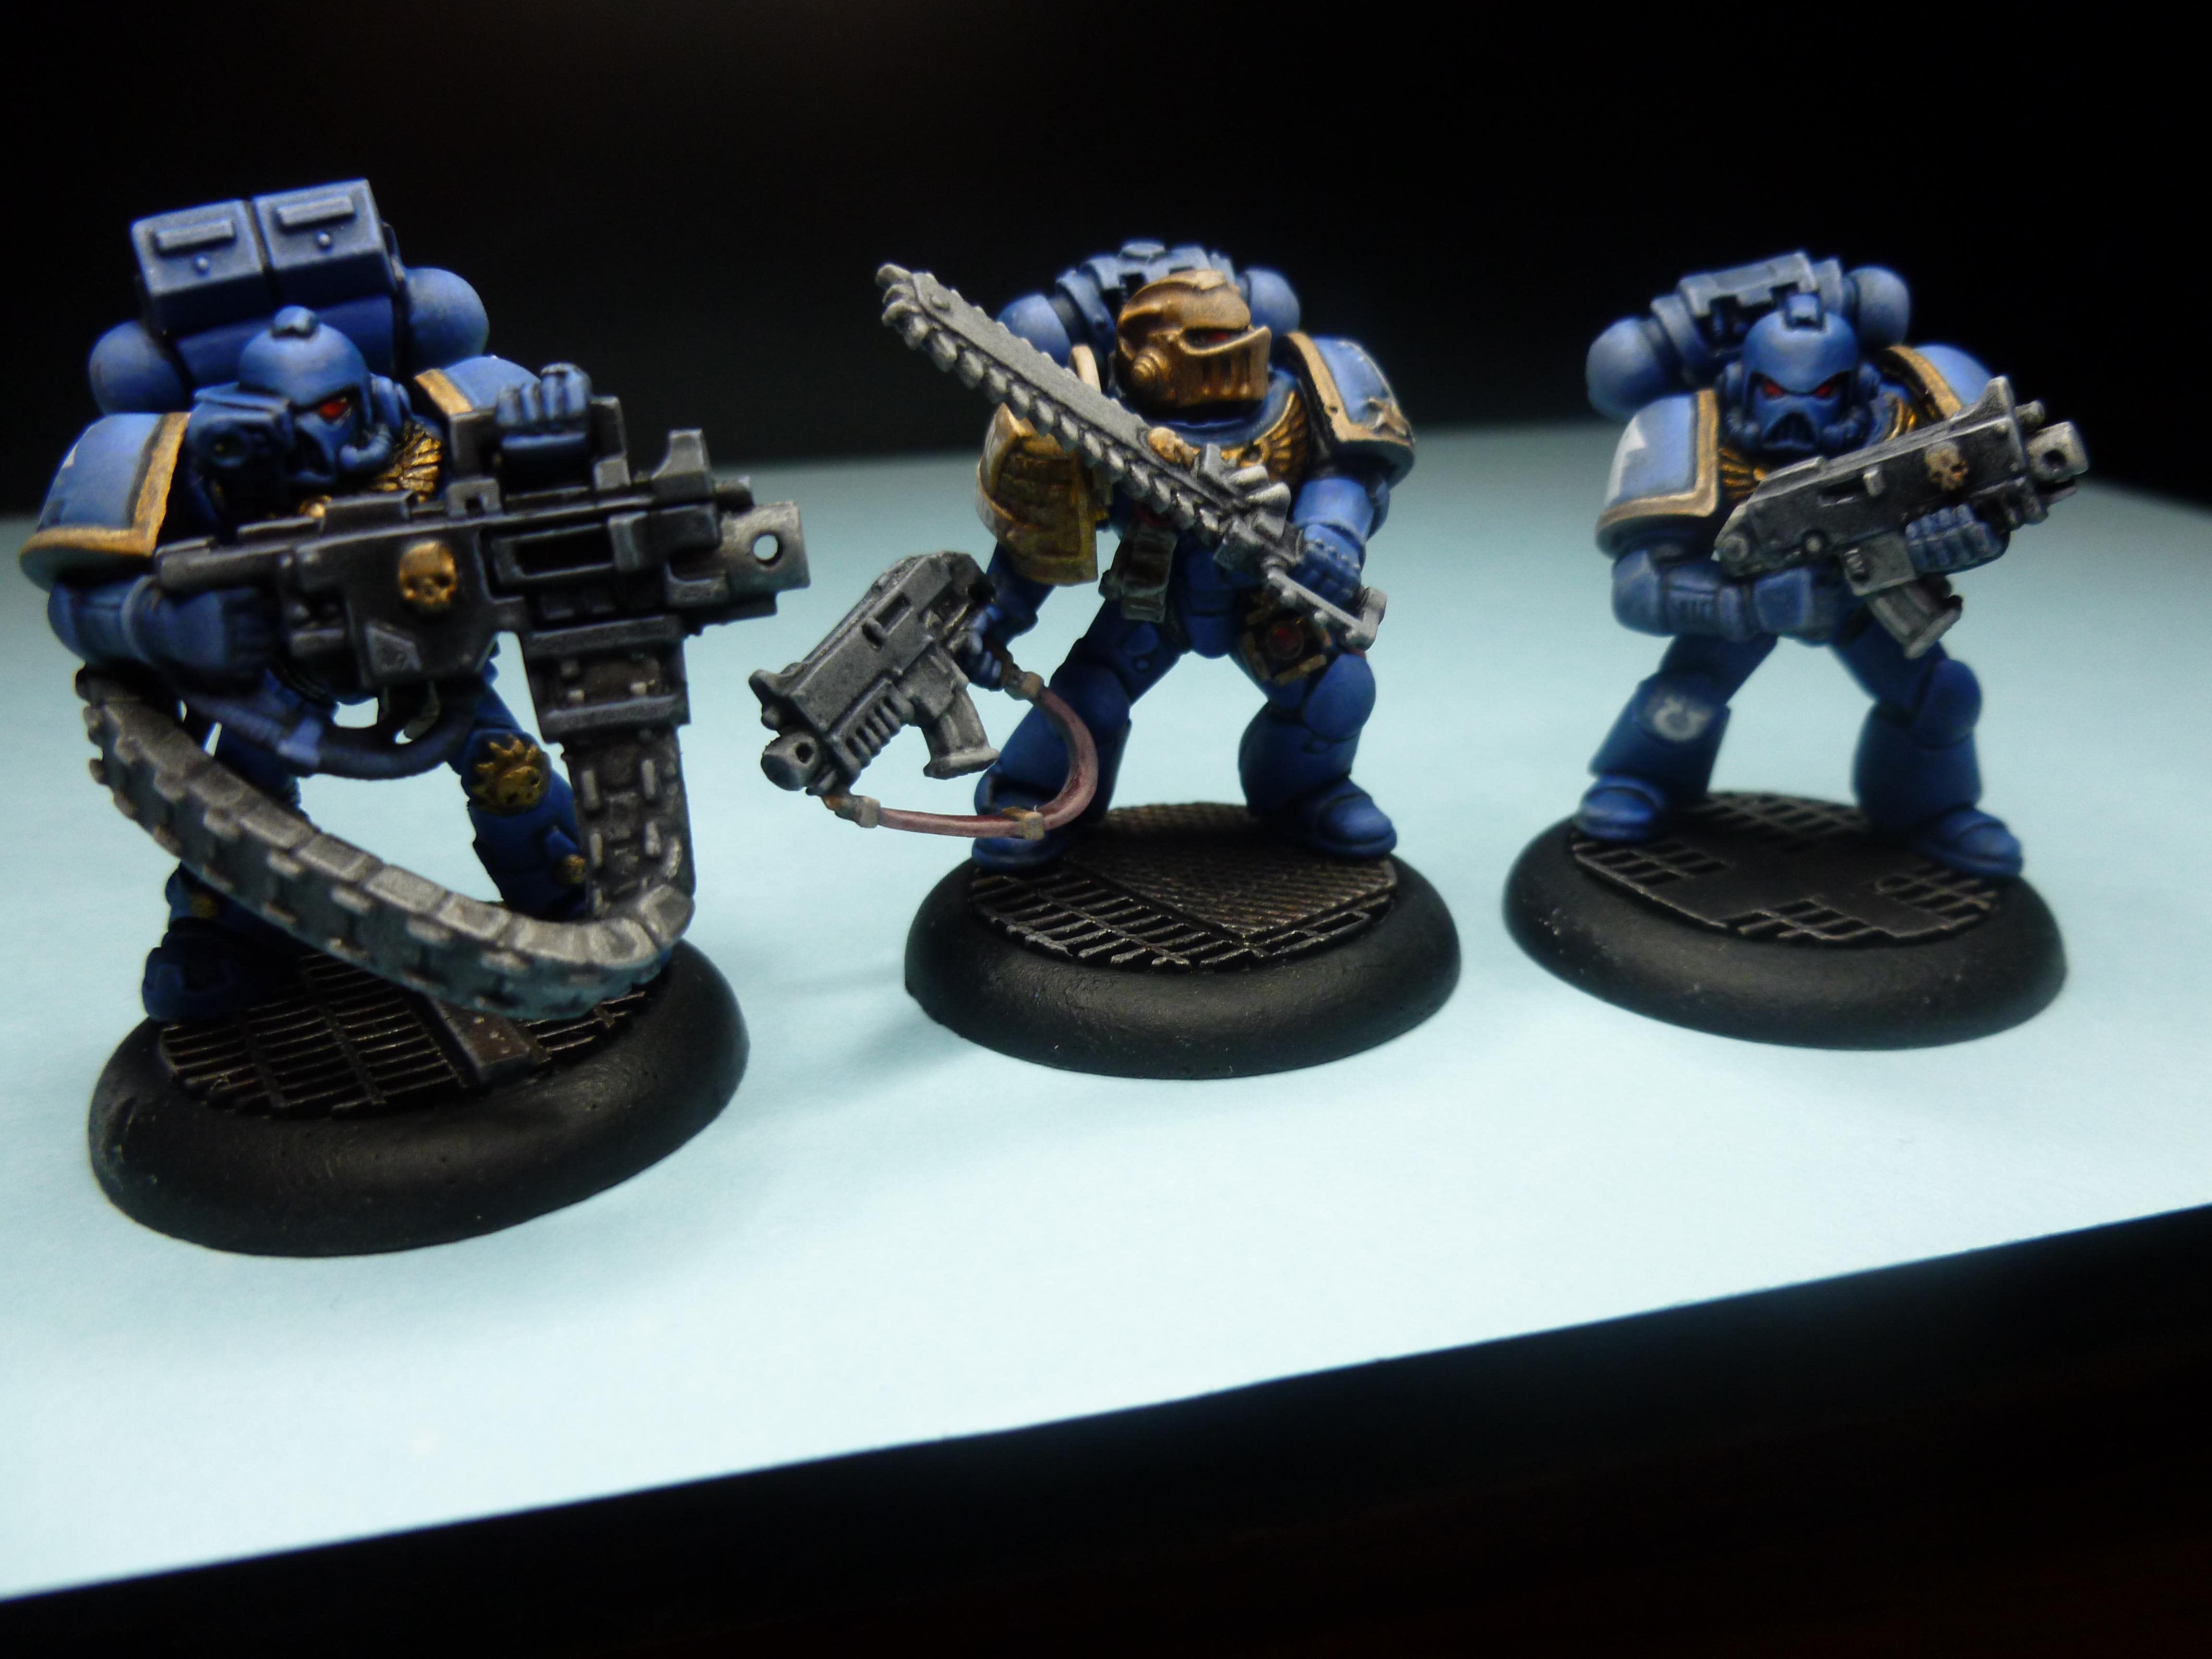 Blending, Kill Team, Space Hulk, Space Marines, Tactical Squad, Ultramarines, Wet